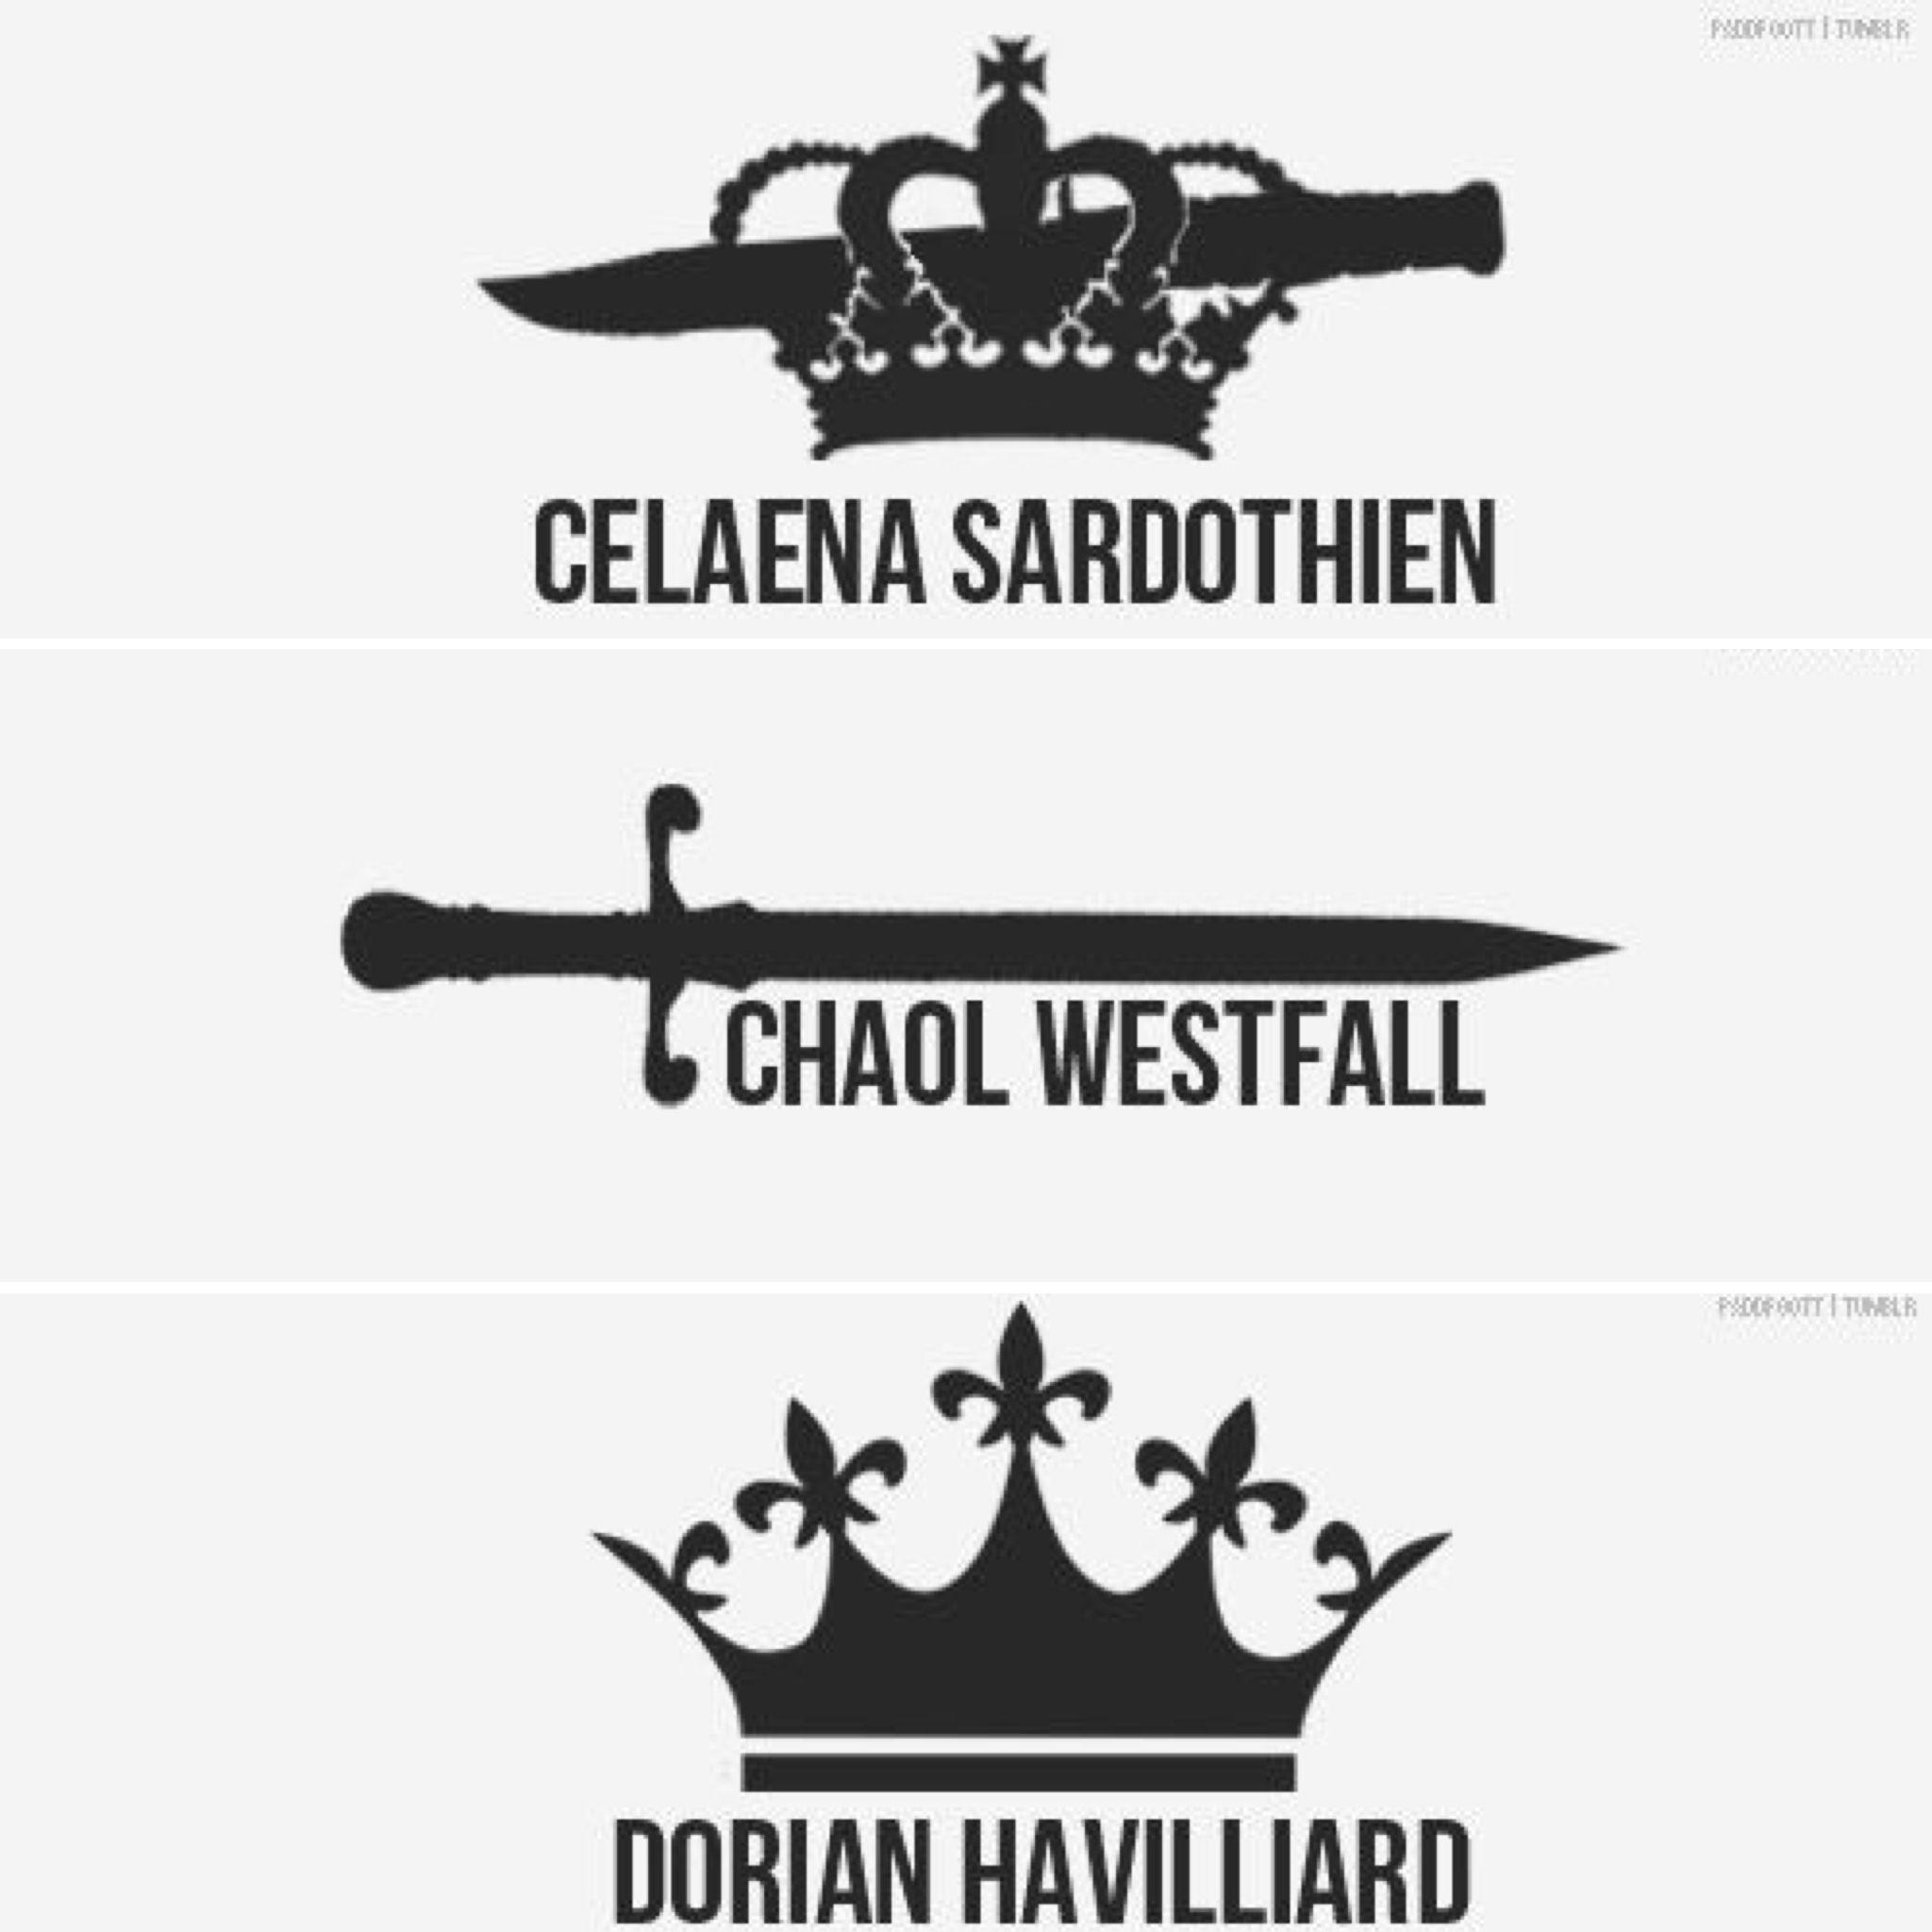 Celaena Sardothien ~ Chaol Westfall ~ Dorian Havilliard